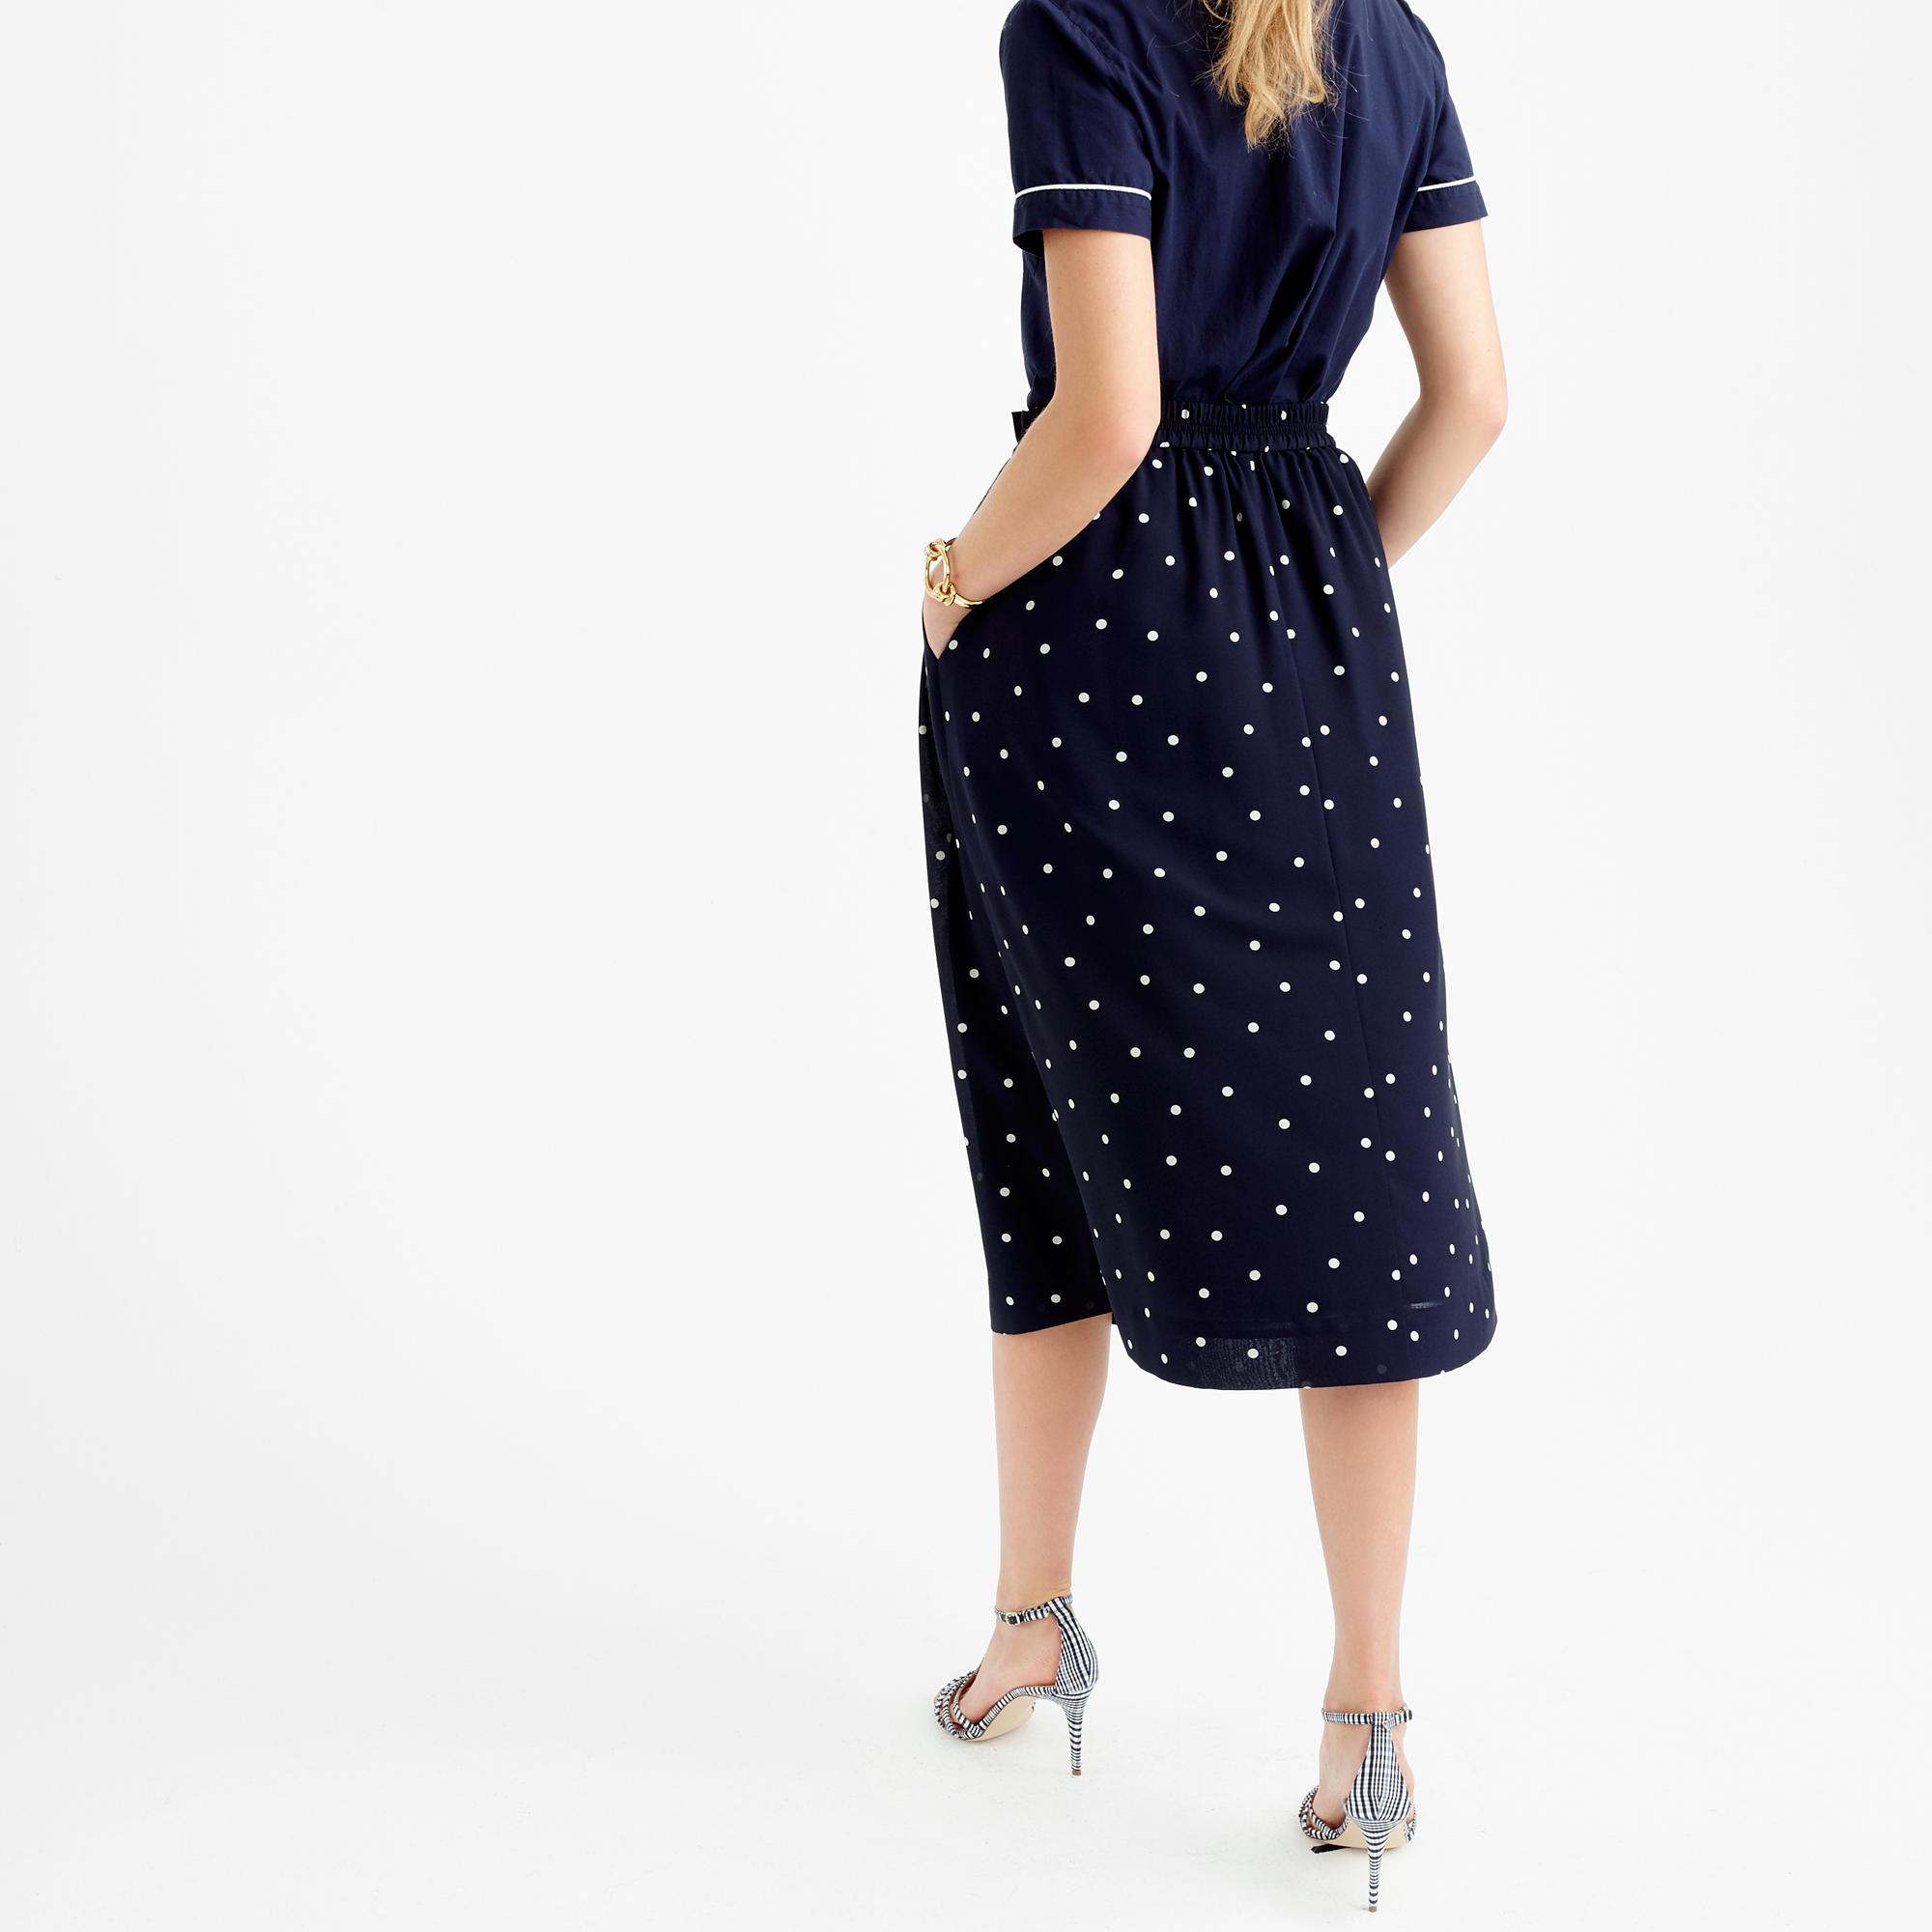 j crew pleated midi skirt in polka dot in blue lyst